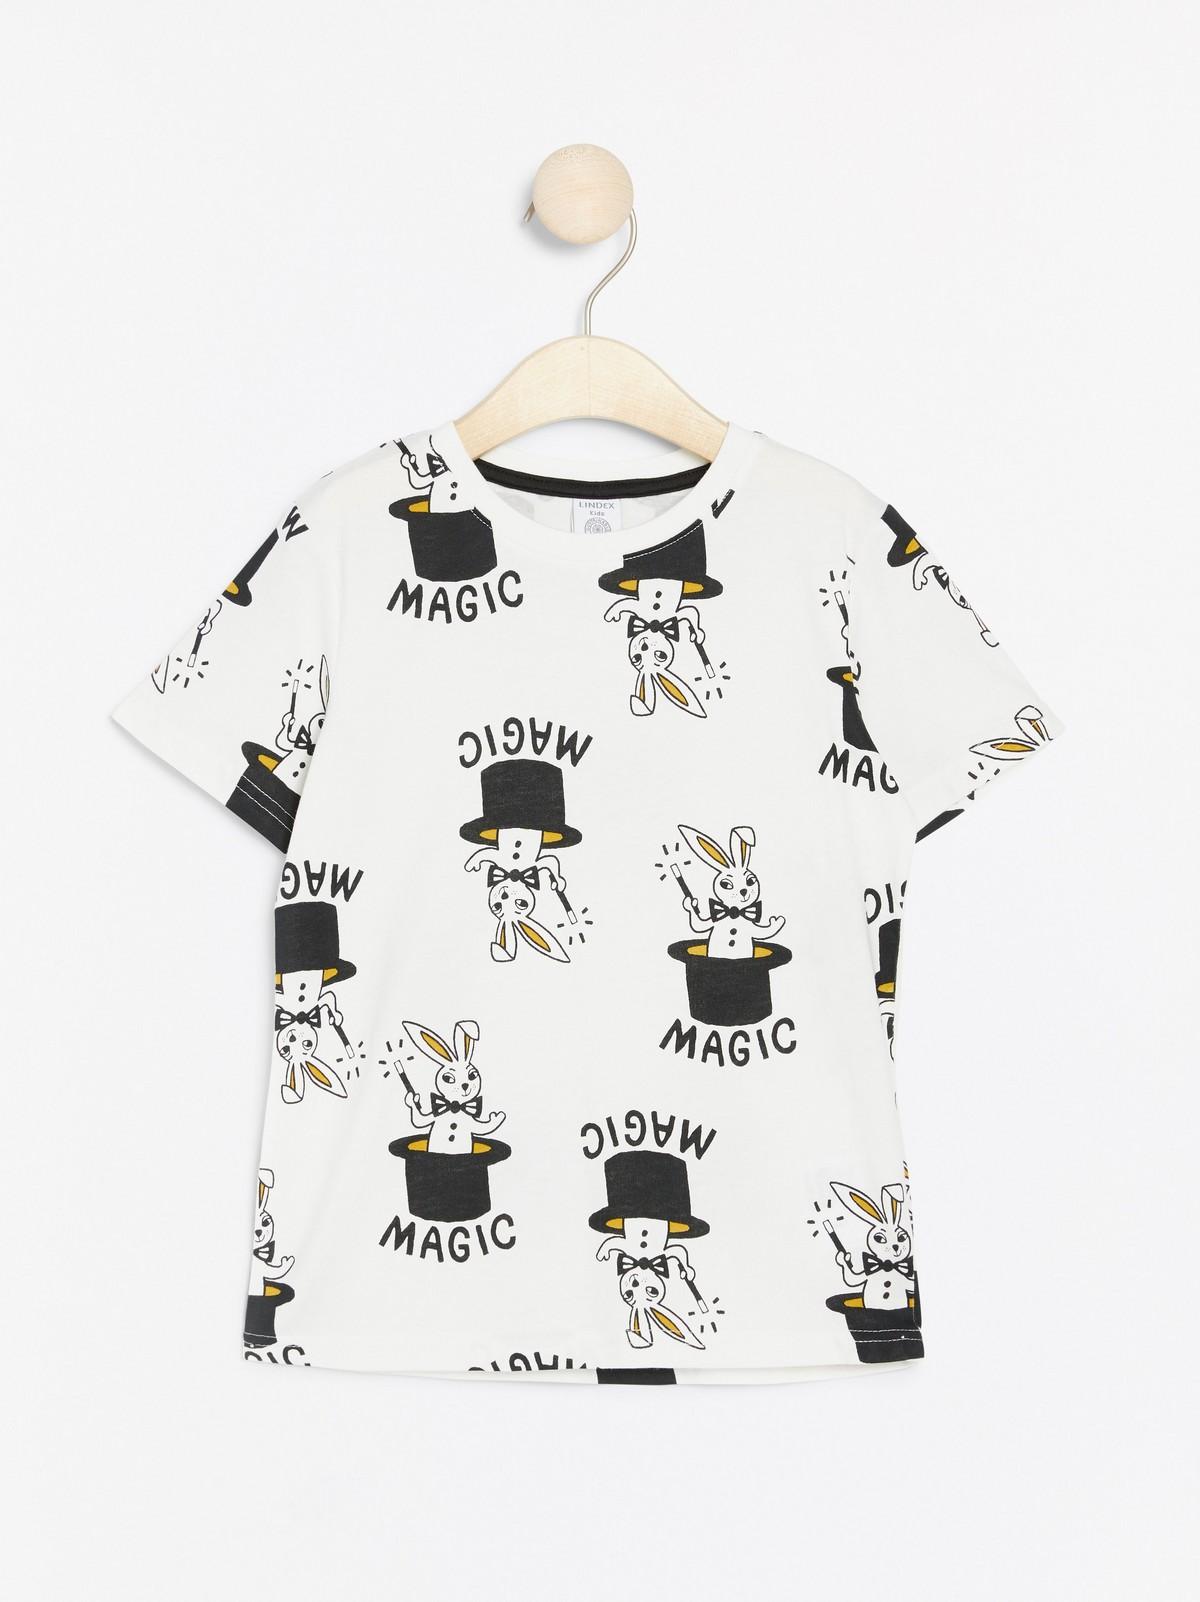 Magic Rabbit in the Top Hat  Tshirt